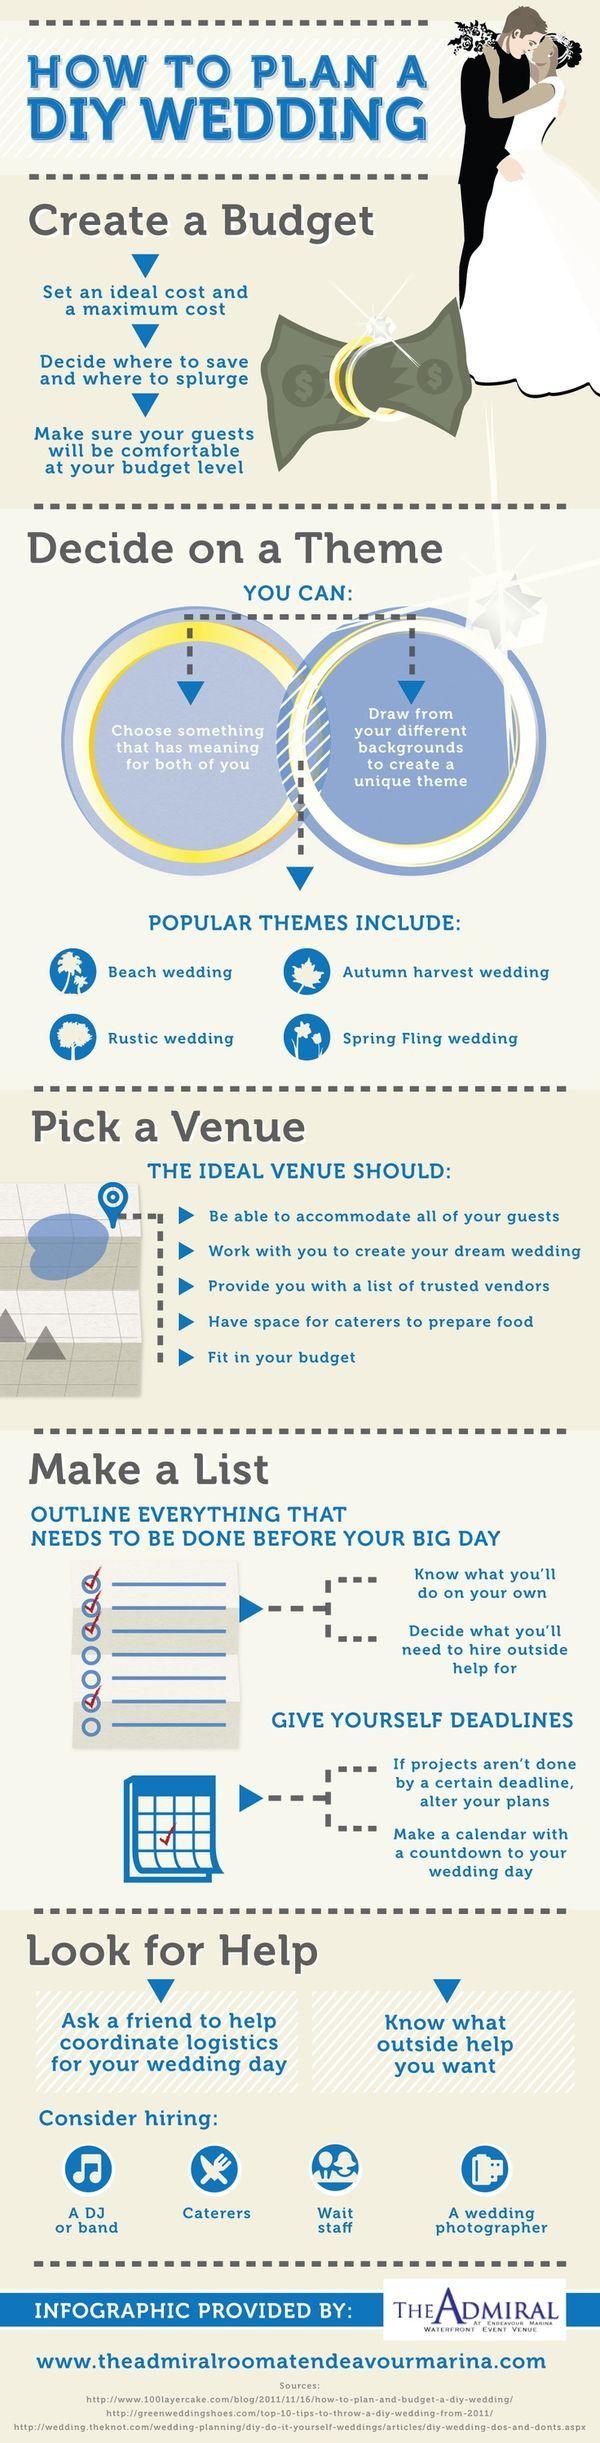 DIY Wedding - The everything Wedding Wiki